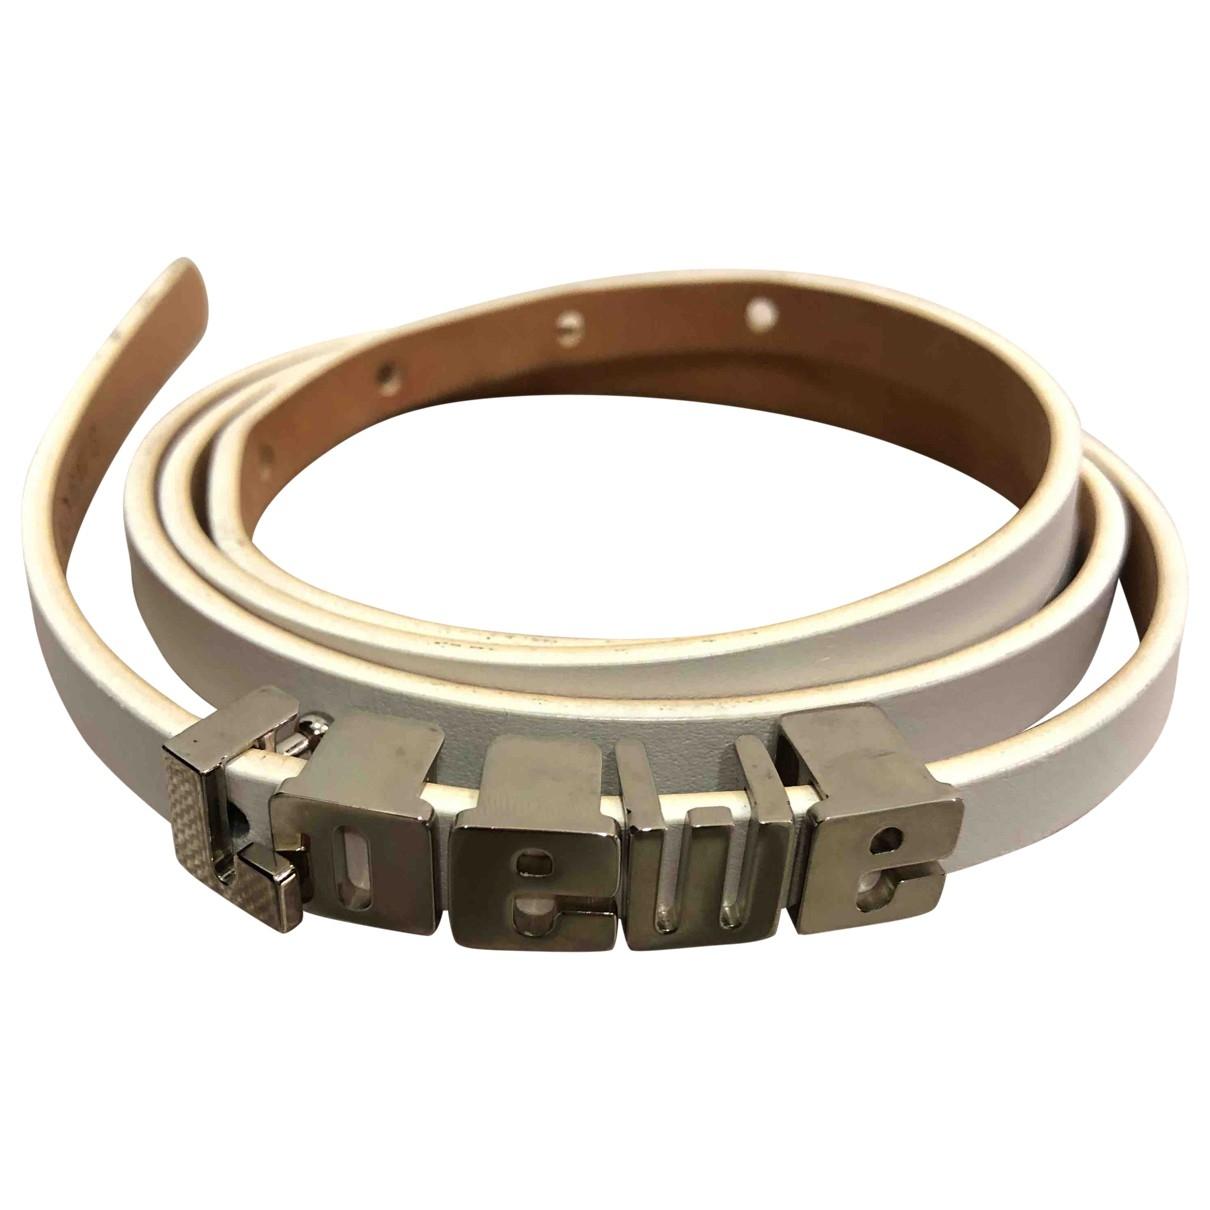 Loewe \N White Leather belt for Women 80 cm